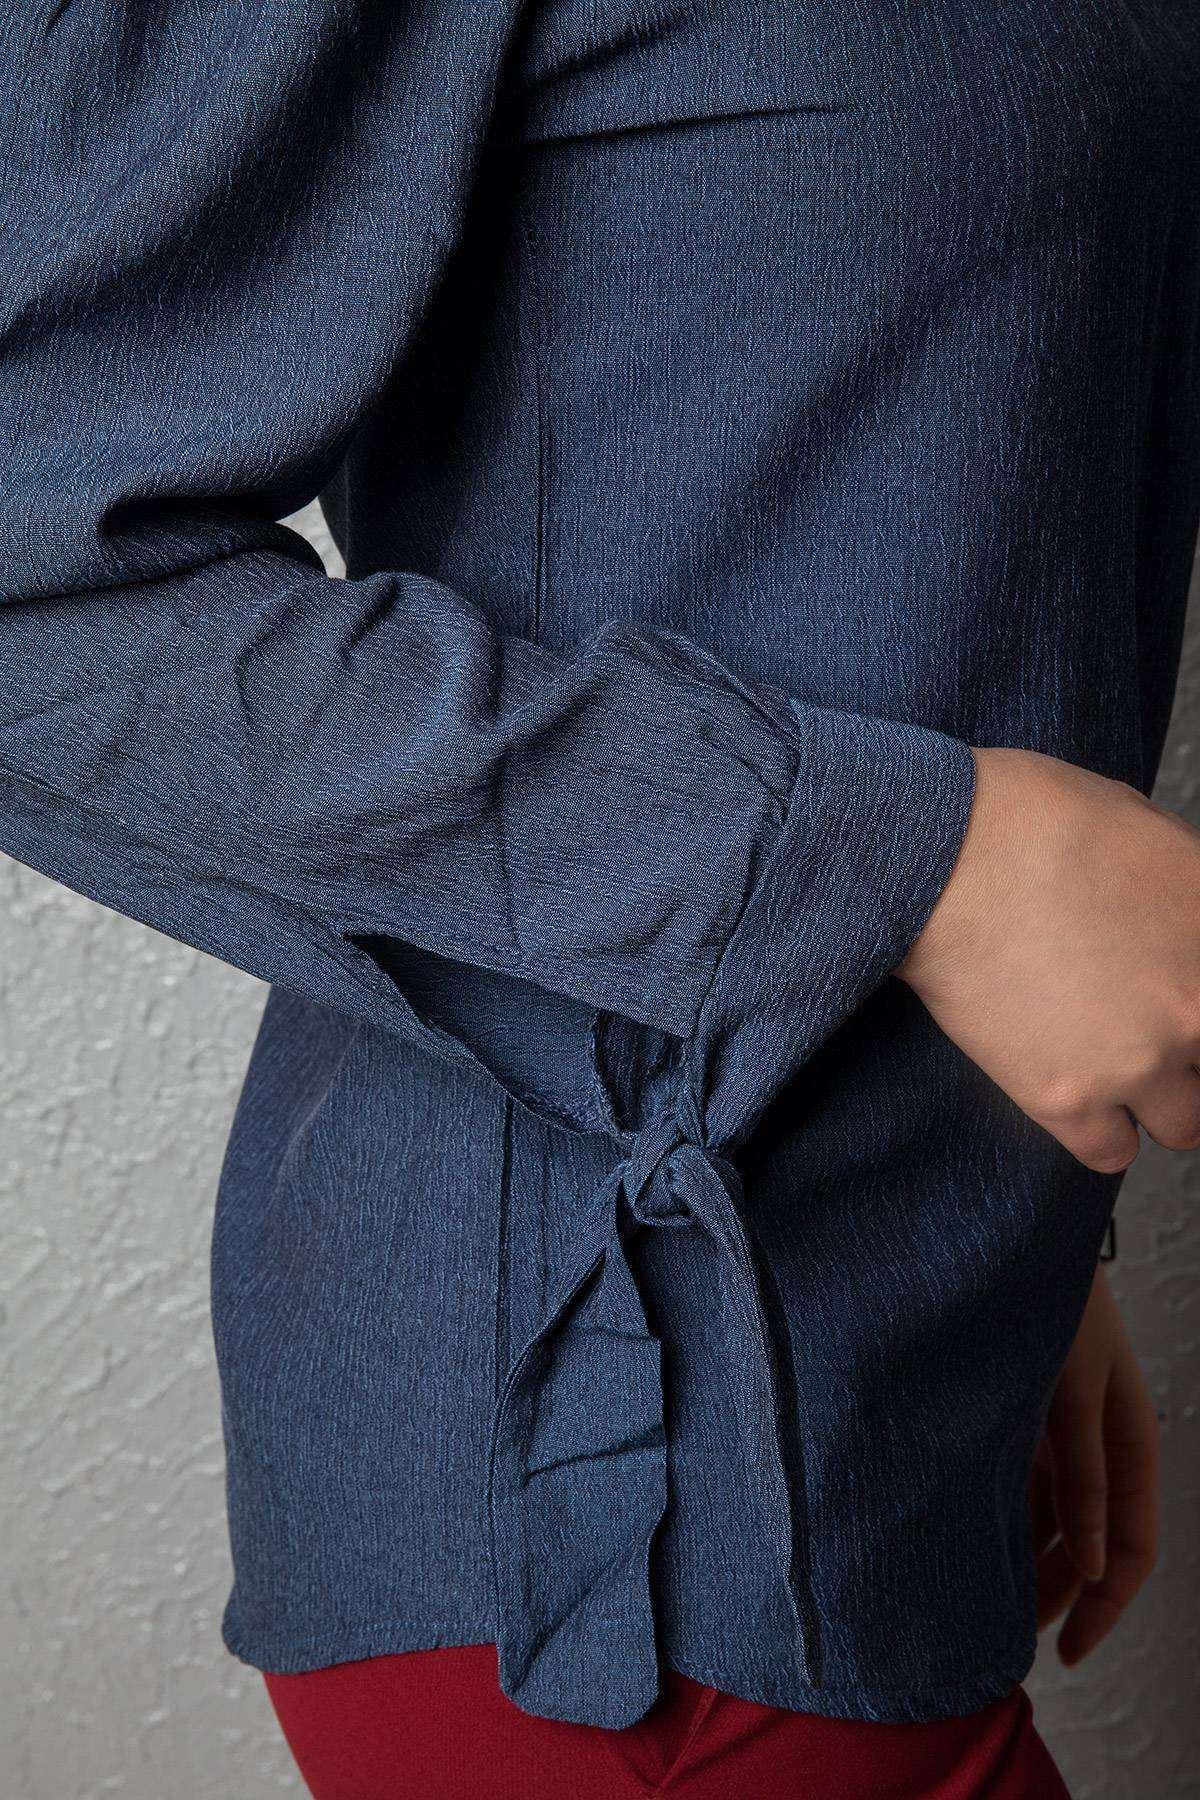 Kol Bağlamalı Straplez Bluz Laci